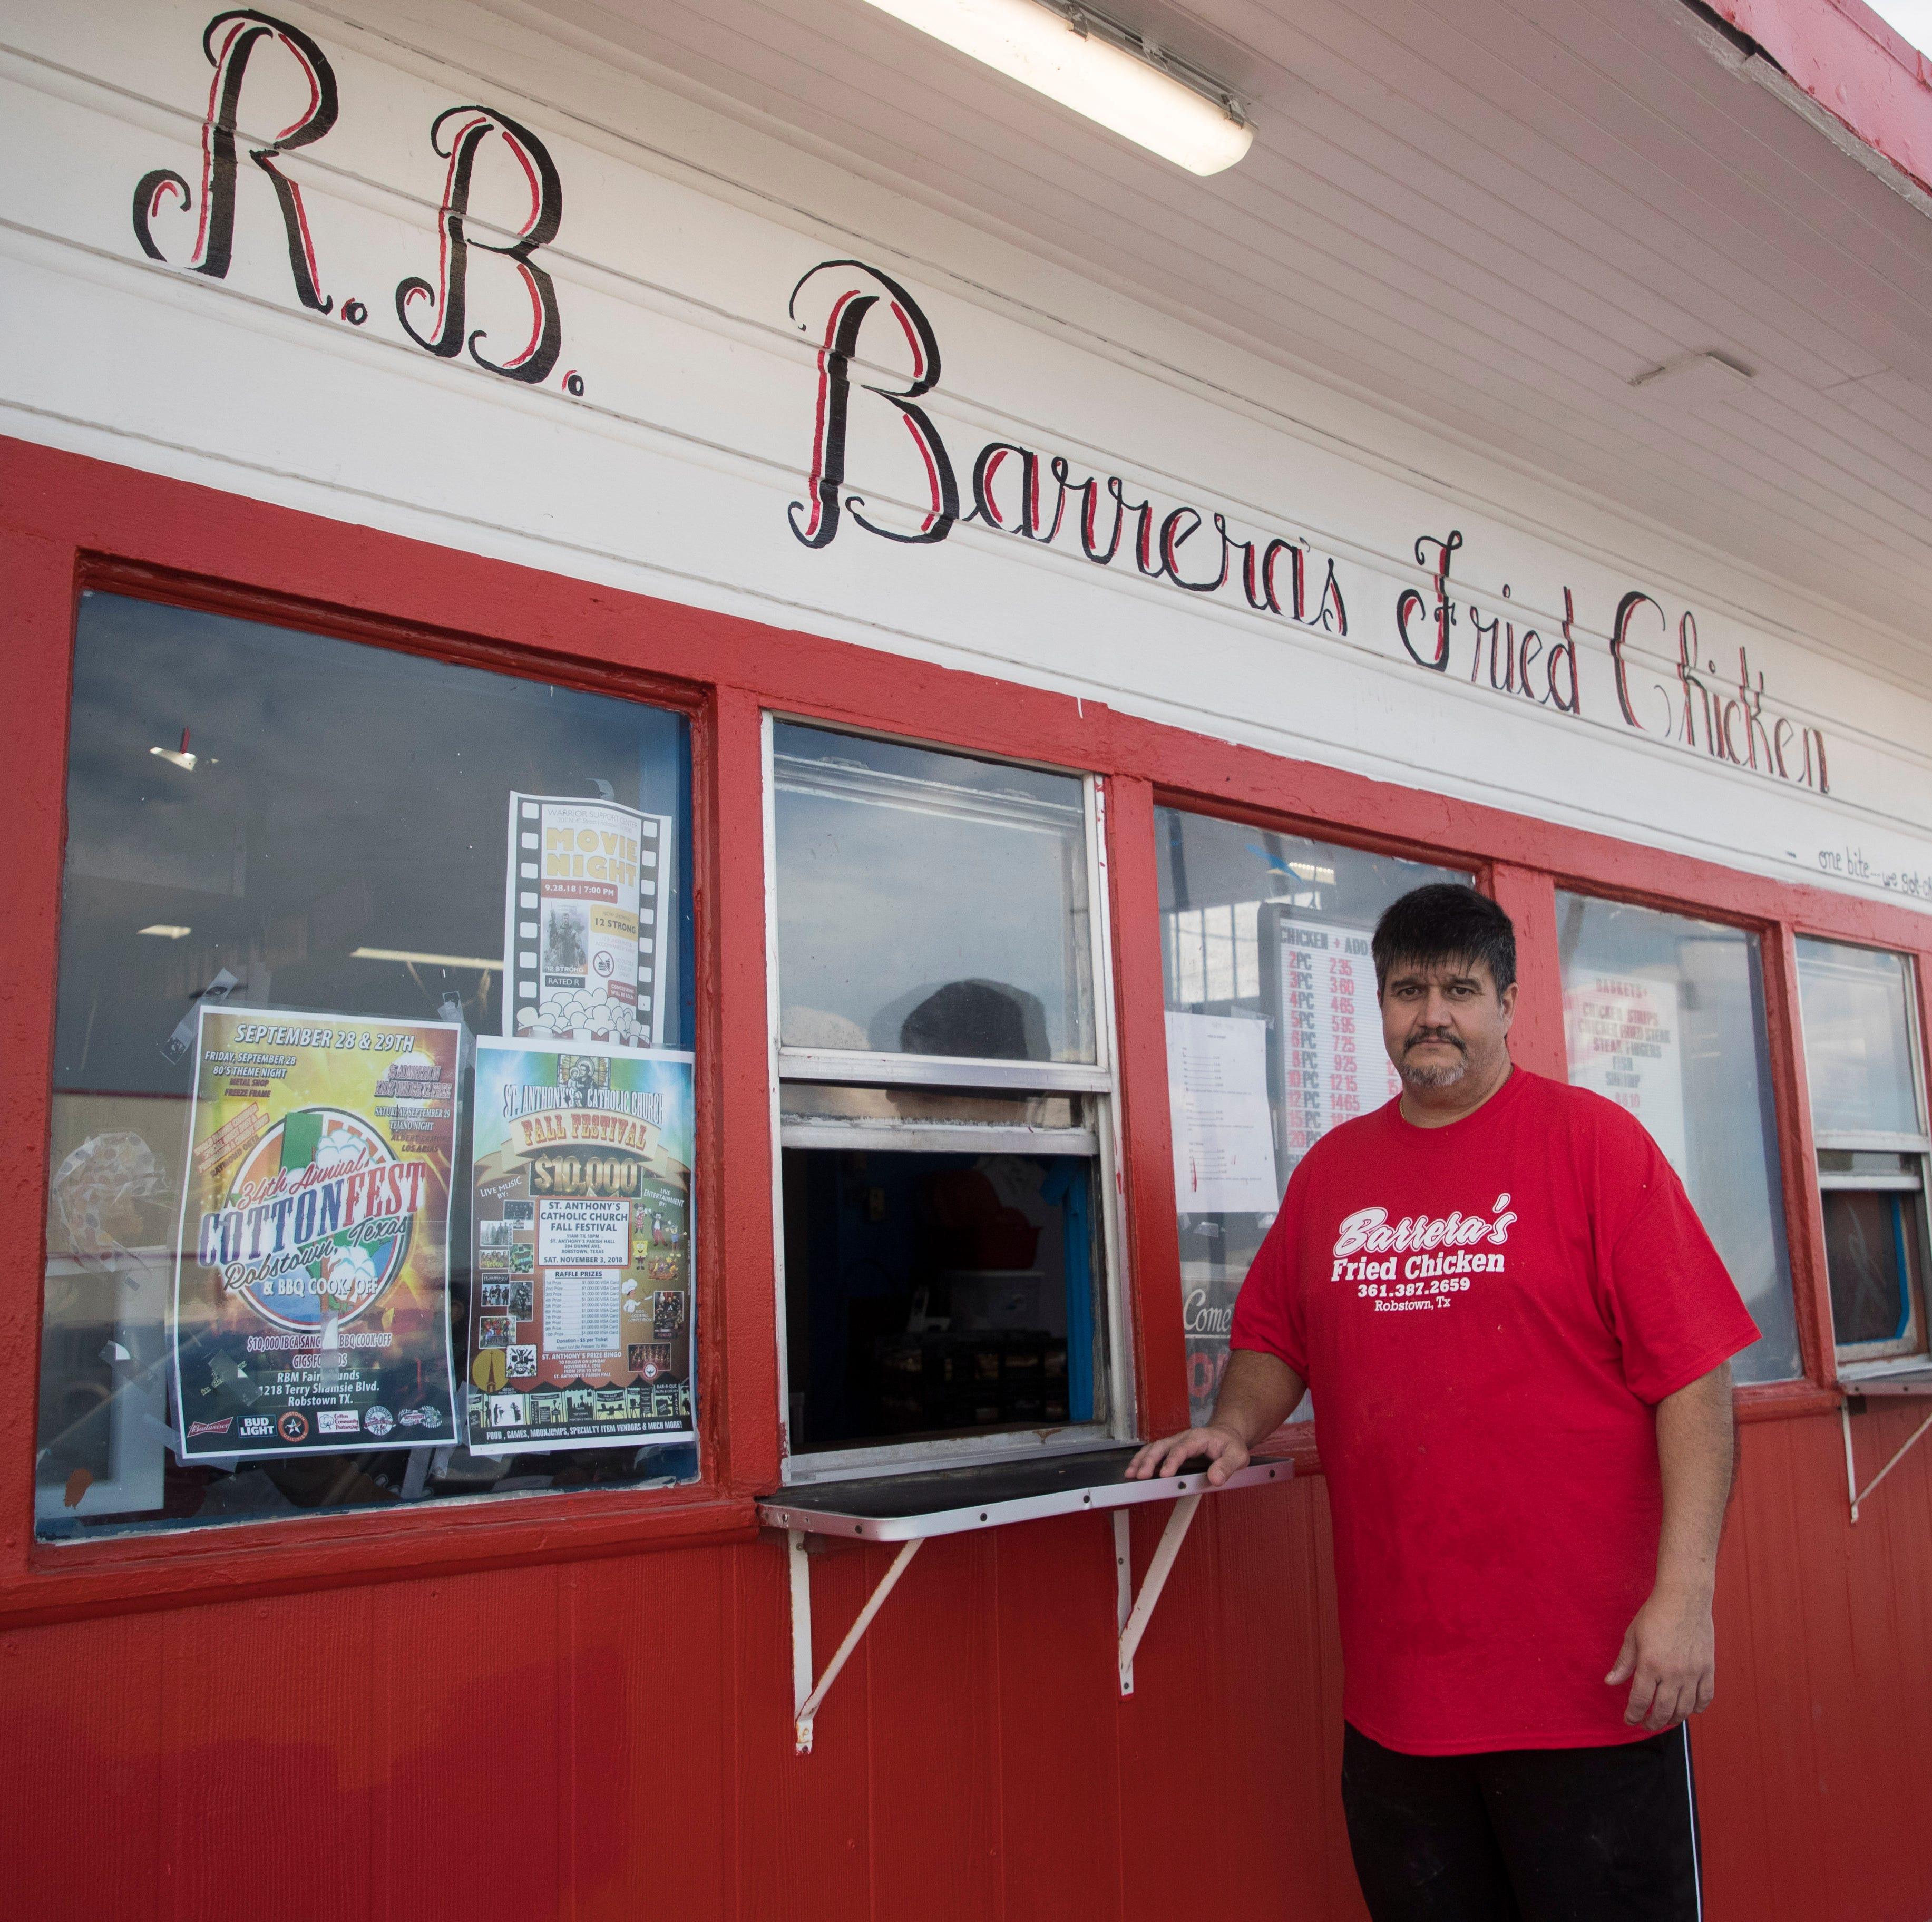 Barrera's Fried Chicken in Robstown featured on 'Texas Bucket List' show